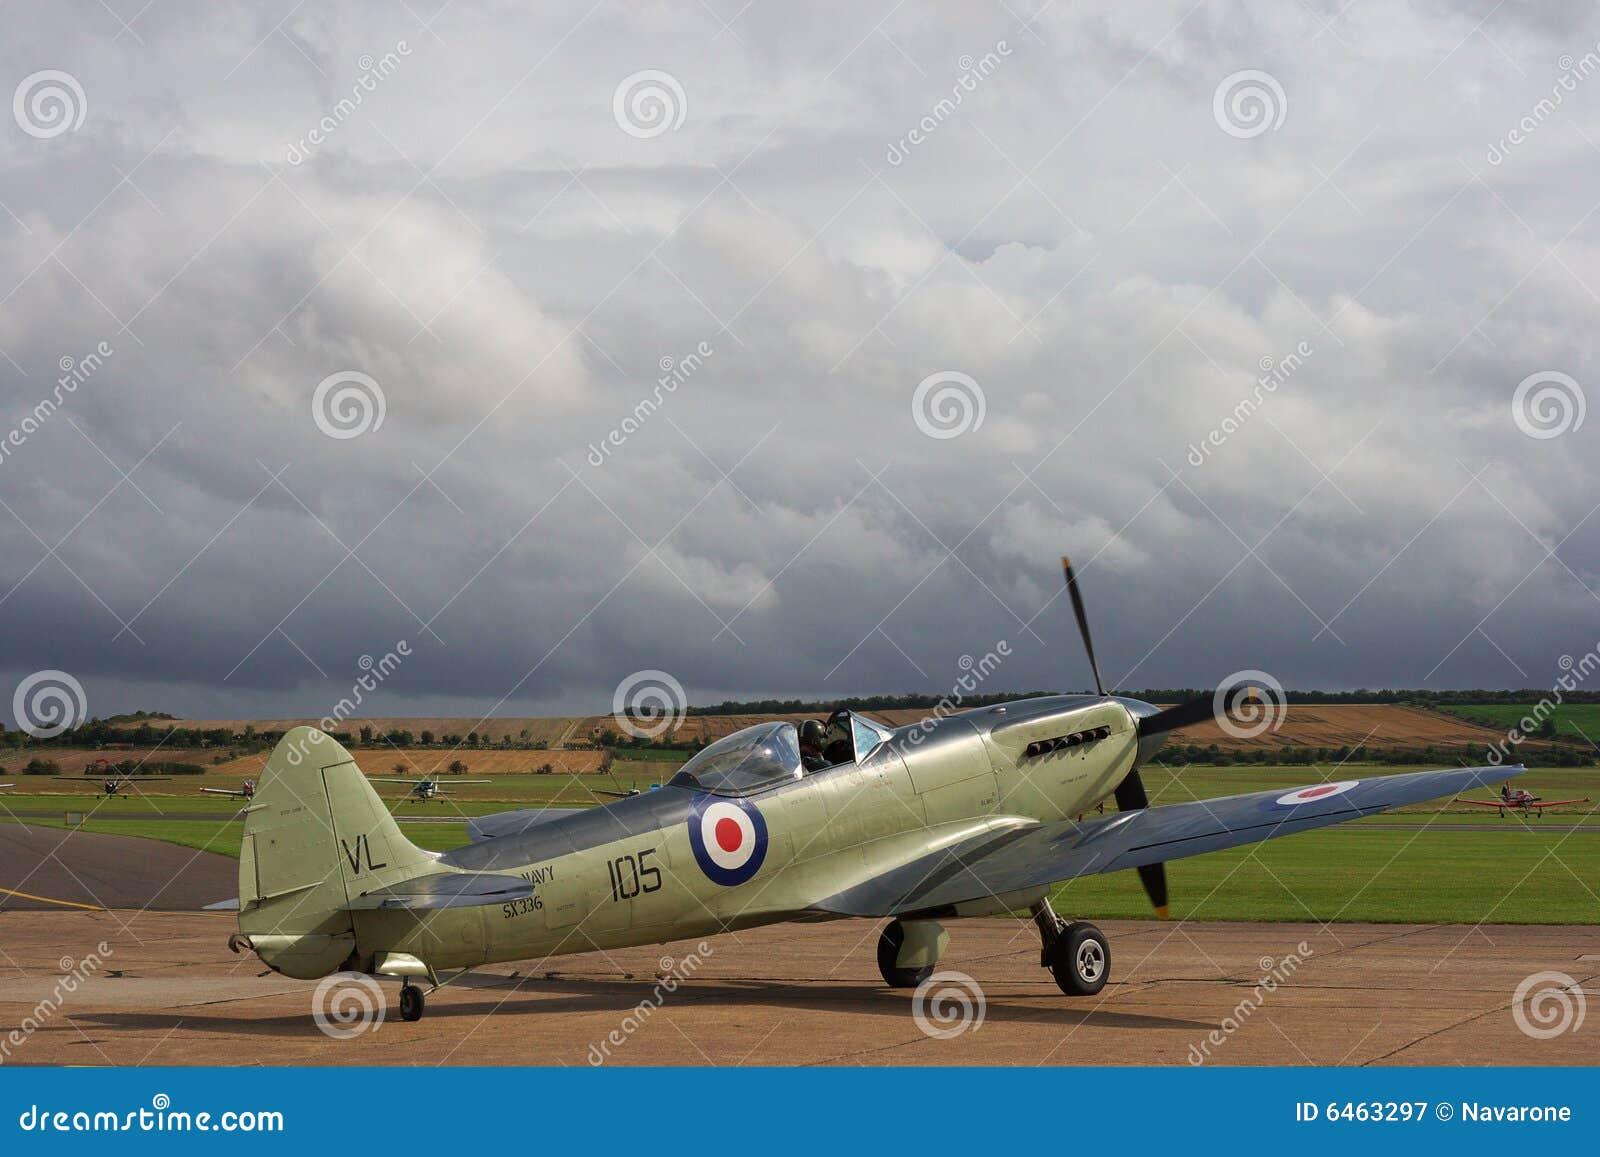 Supermarine Seafire aircraft